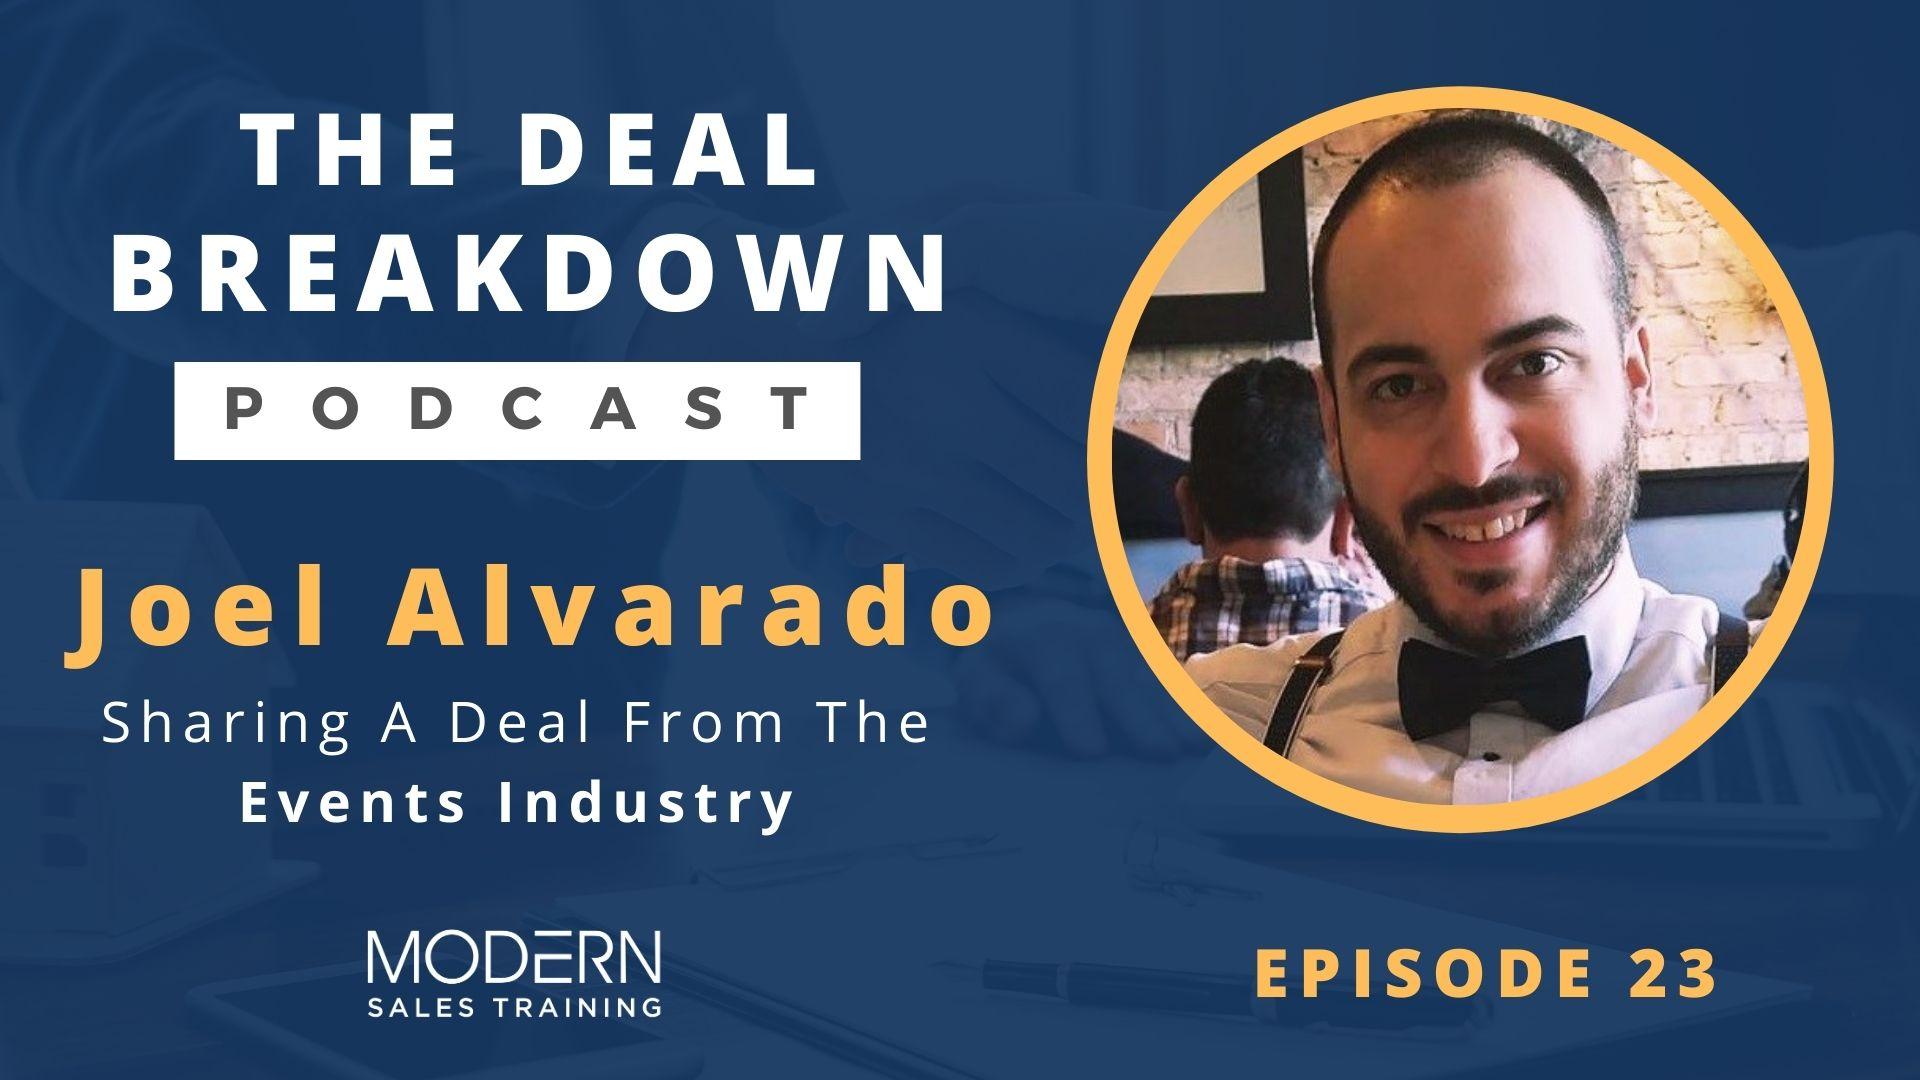 The-Deal-Breakdown-Podcast-Modern-Sales-Training-Joel-Alvarado